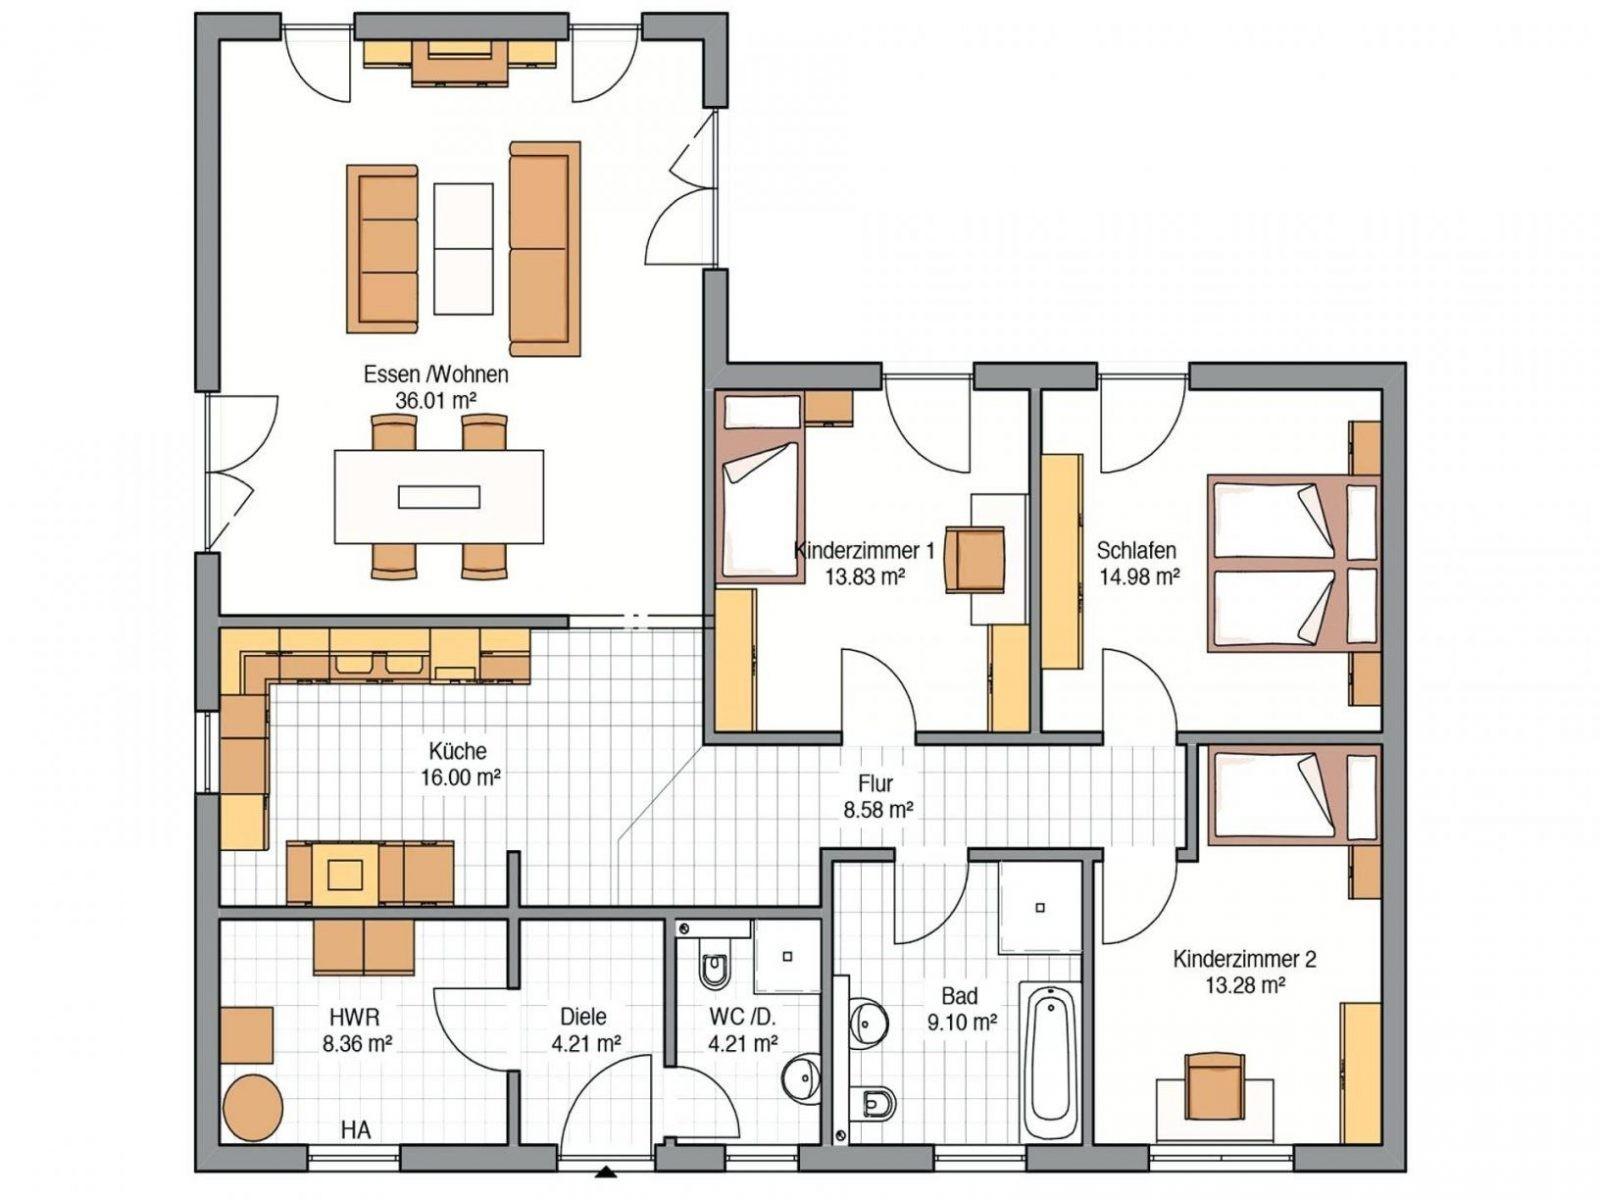 grundrisse bungalow grundriss bungalow 129 grundriss bungalow 4 avec von bungalow grundriss 5. Black Bedroom Furniture Sets. Home Design Ideas